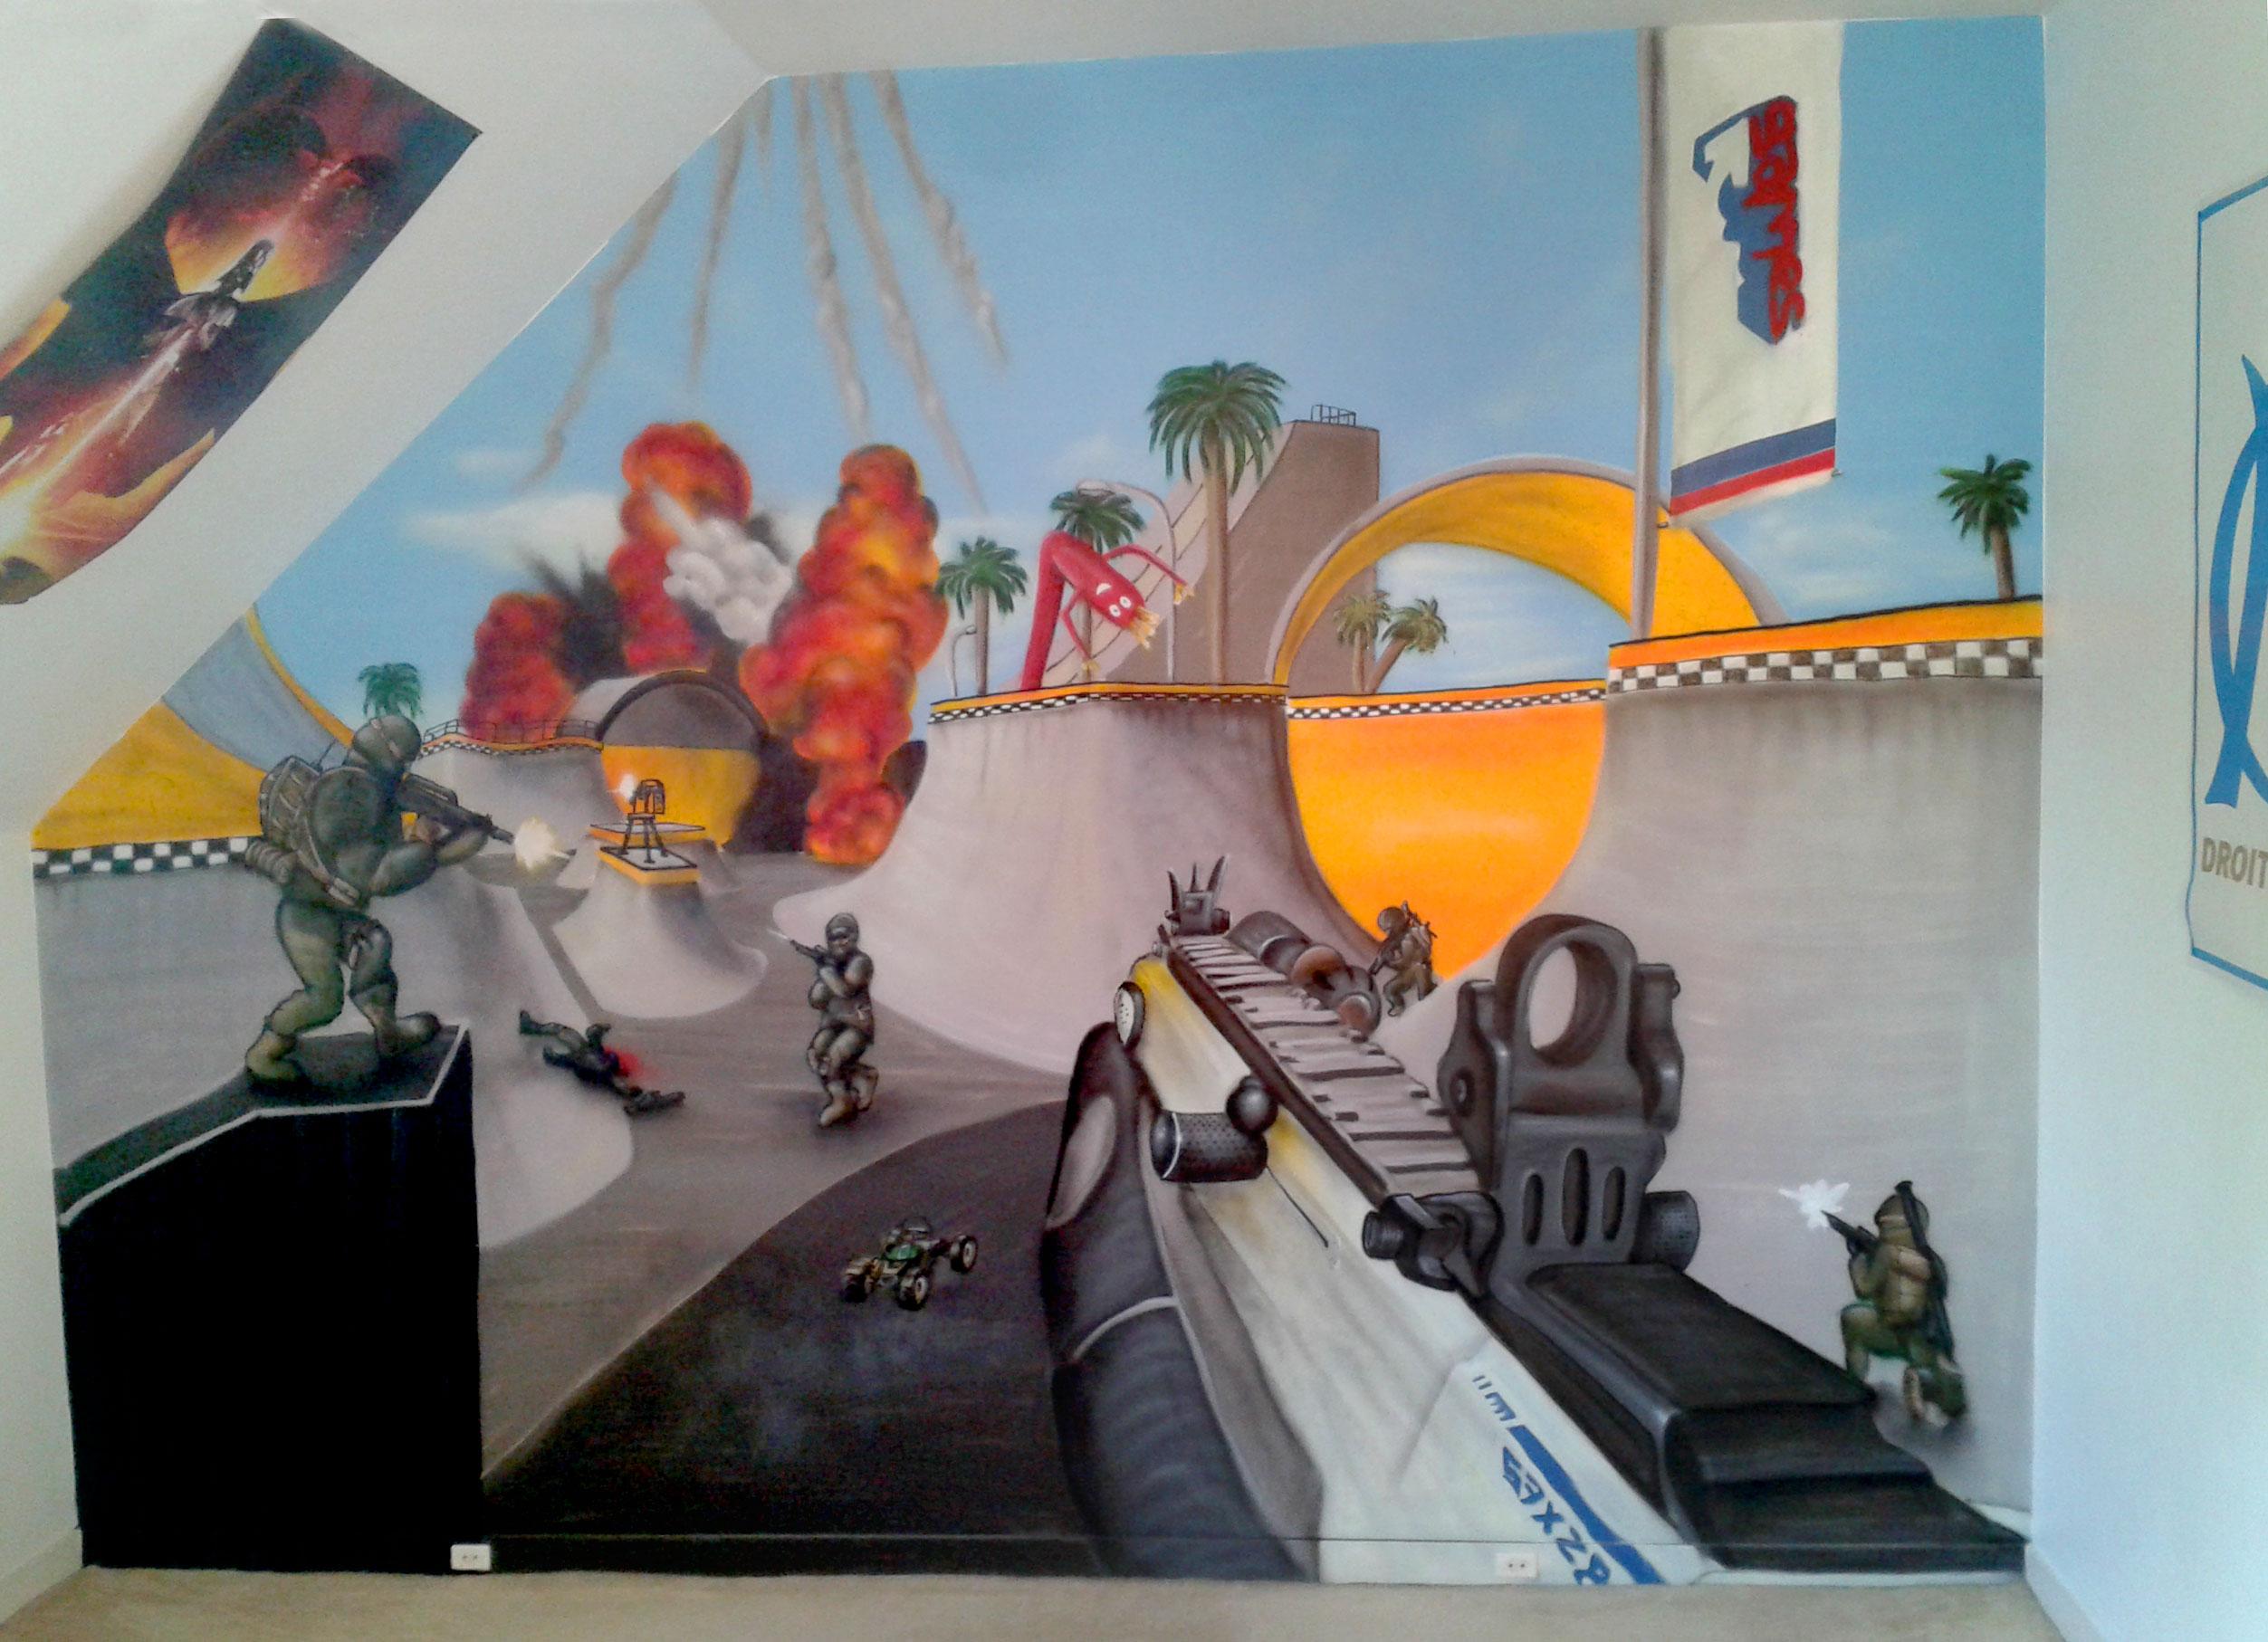 geograffeur-chambre-callofduty-call-of-duty-black-ops-4-graffiti-décoration